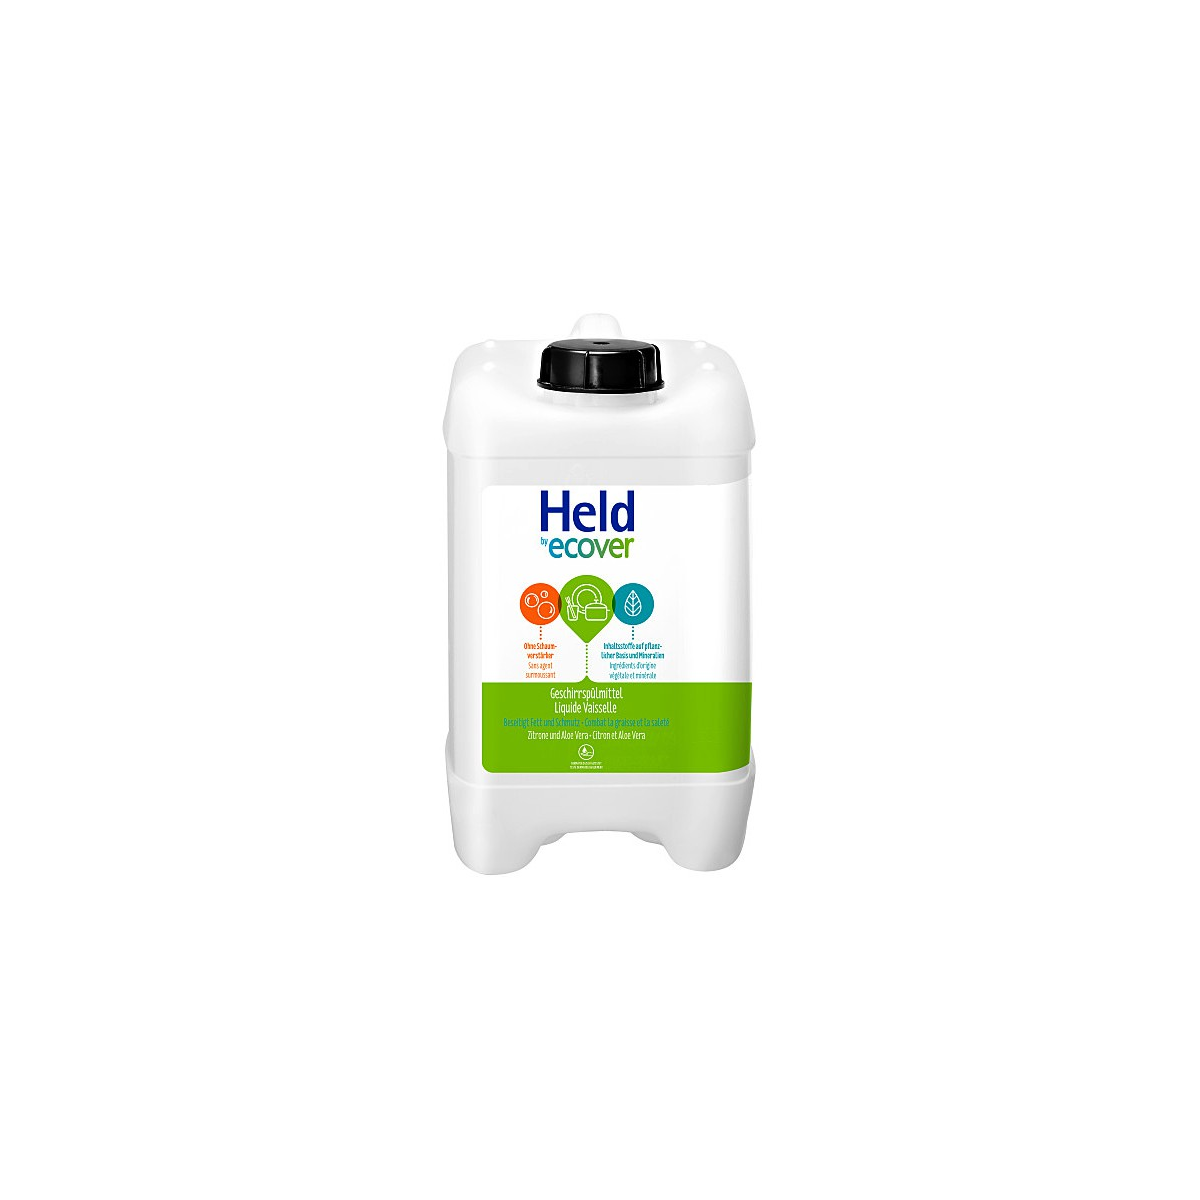 Held Geschirrspülmittel Zitrone Aloe 5L